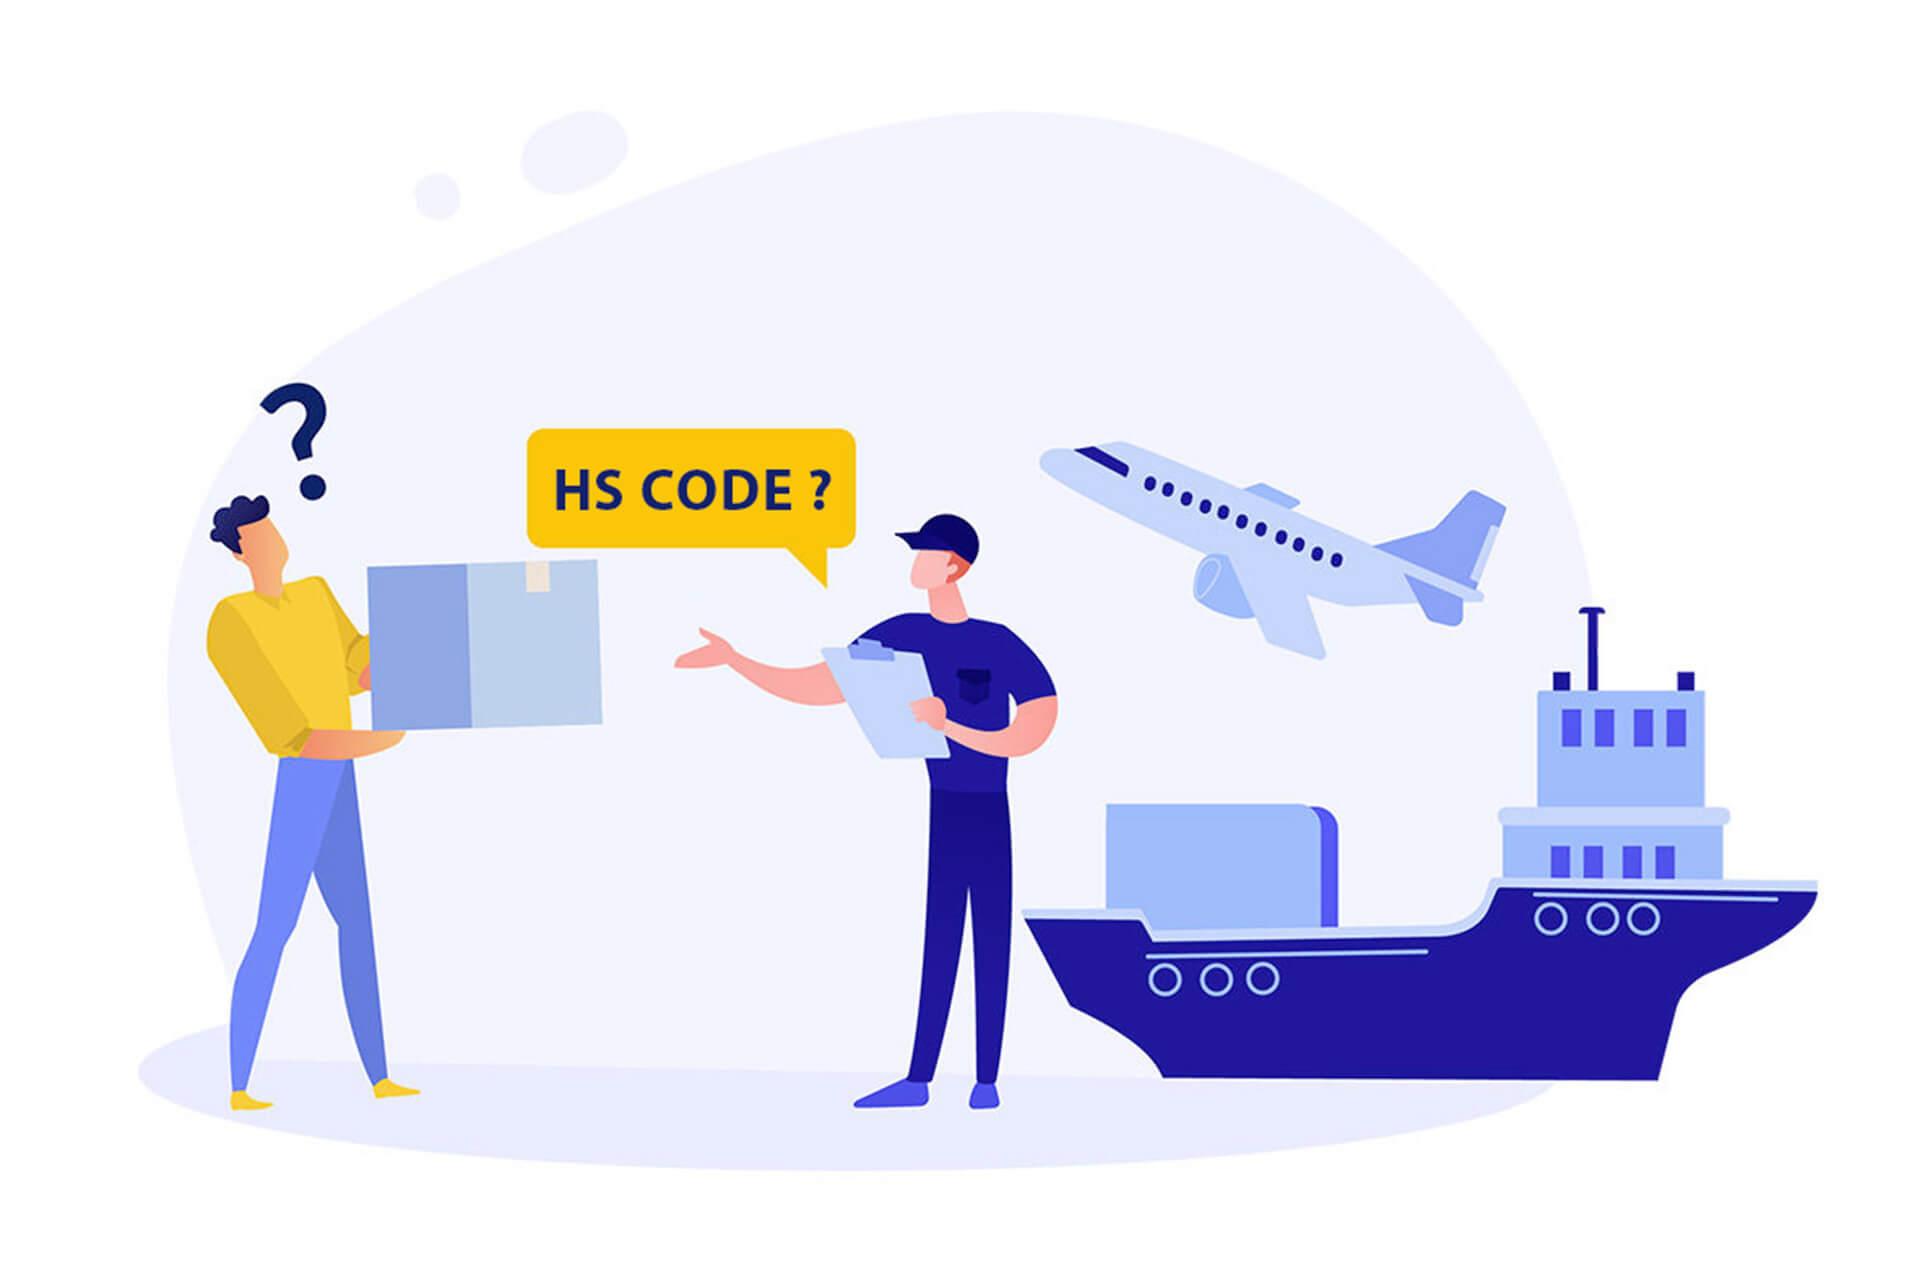 hs code la gi